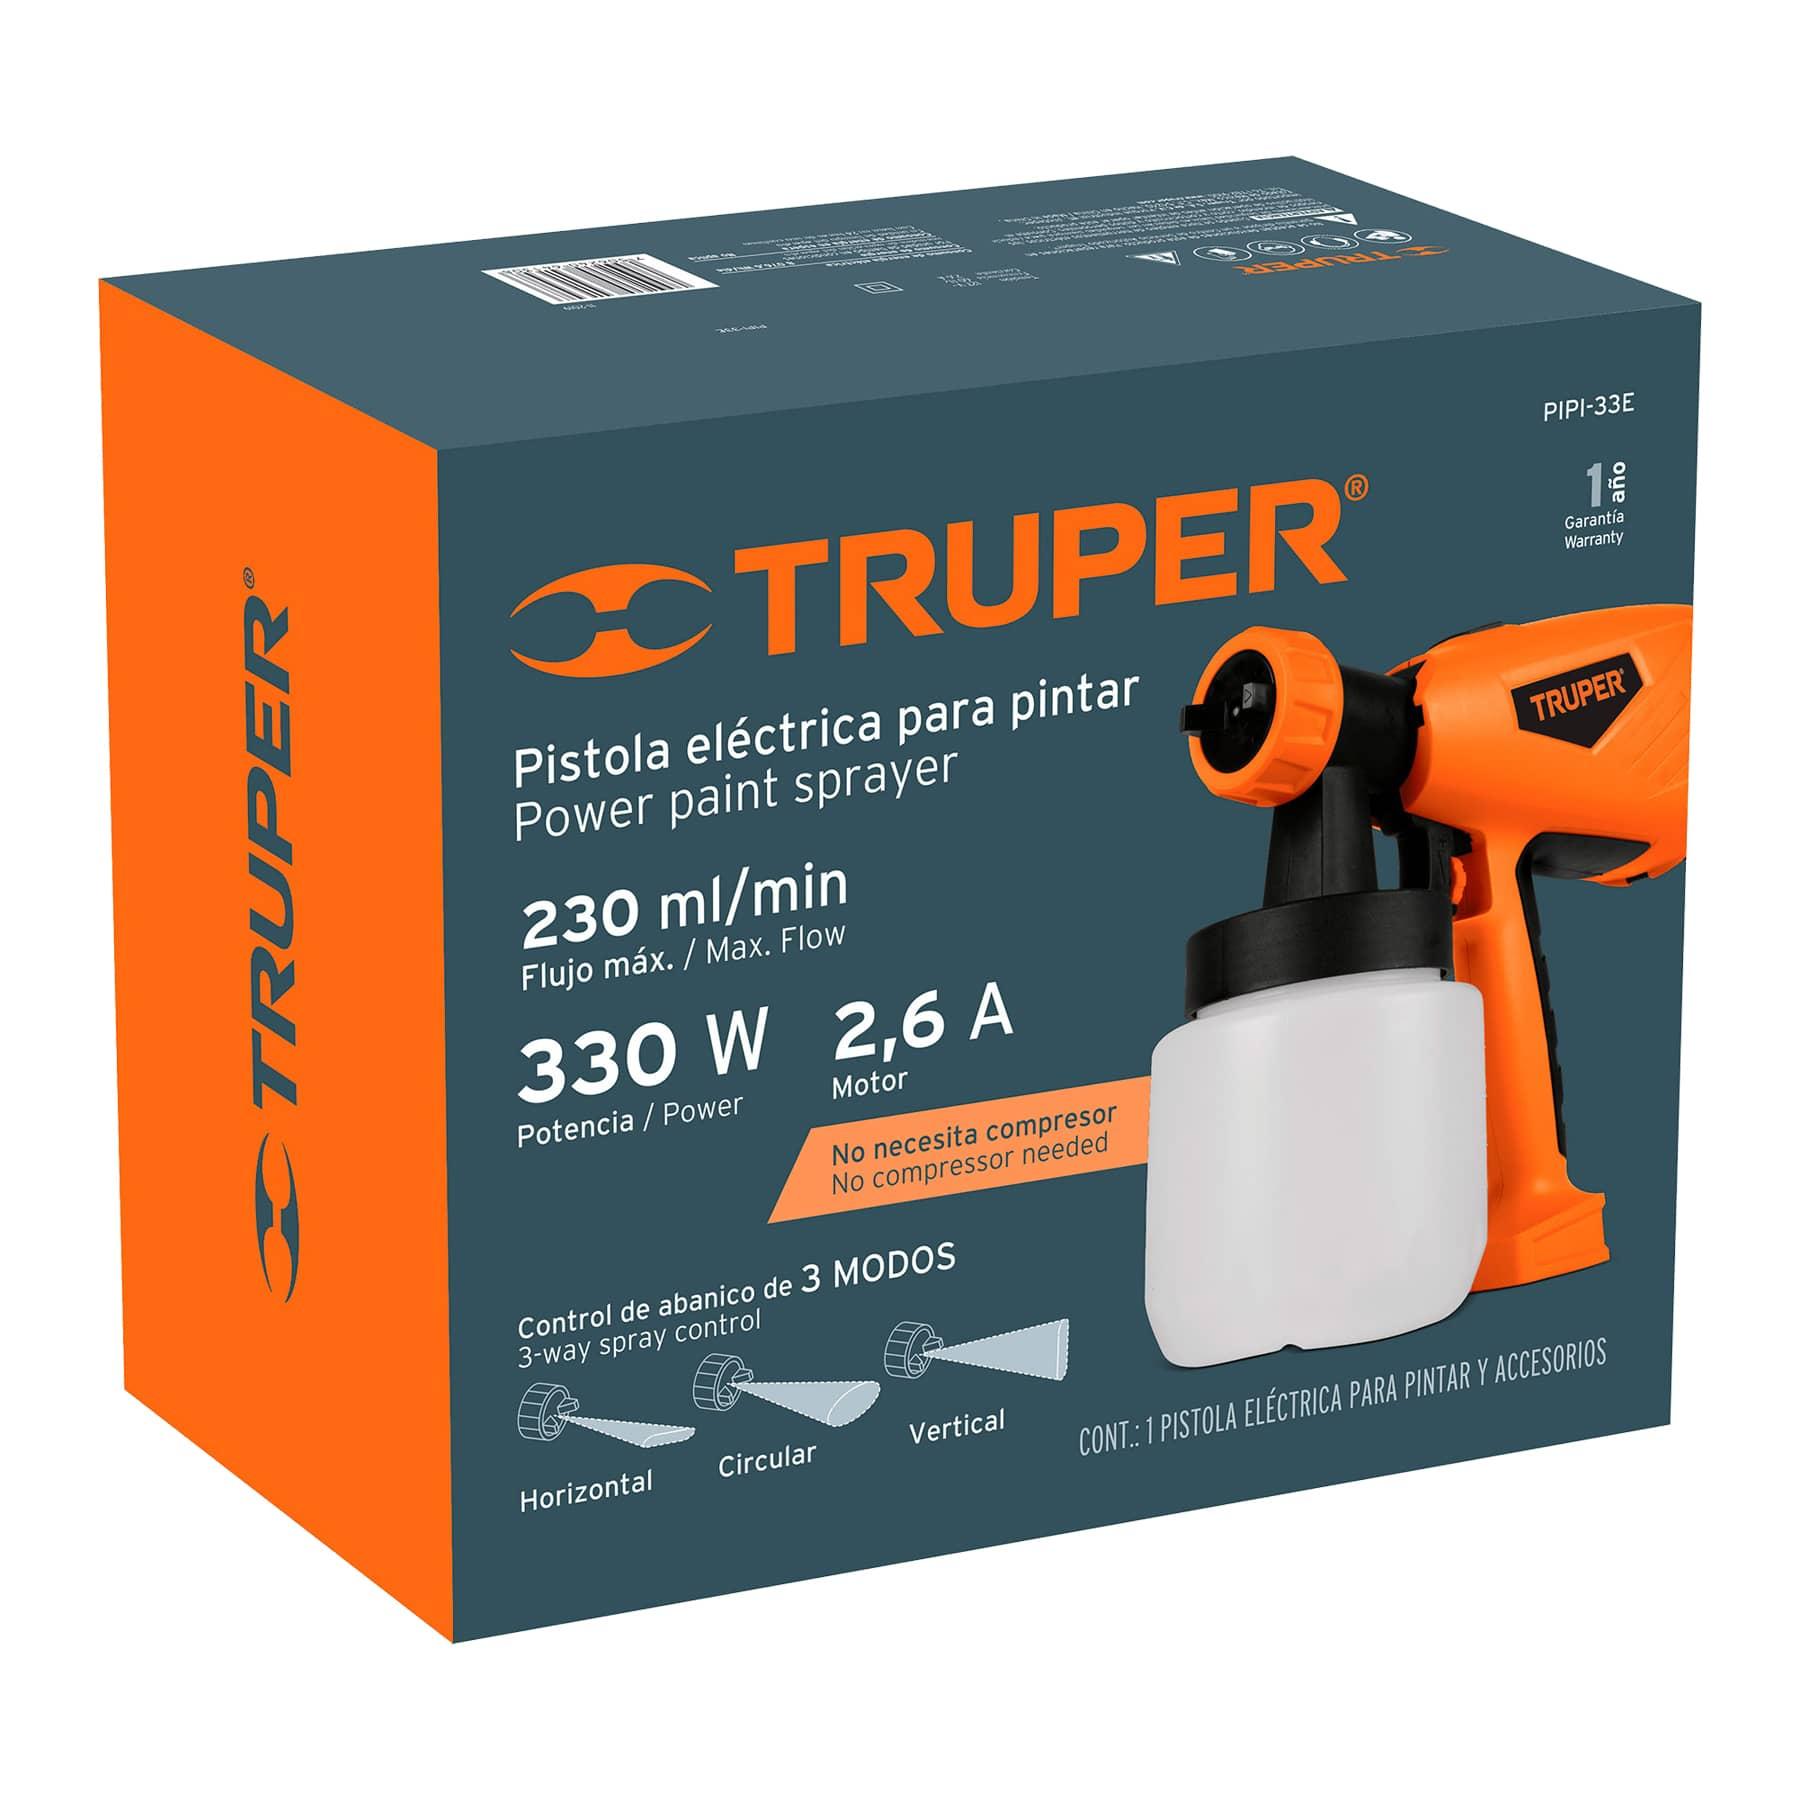 Truper - Pistola para pintar eléctrica, 330 W